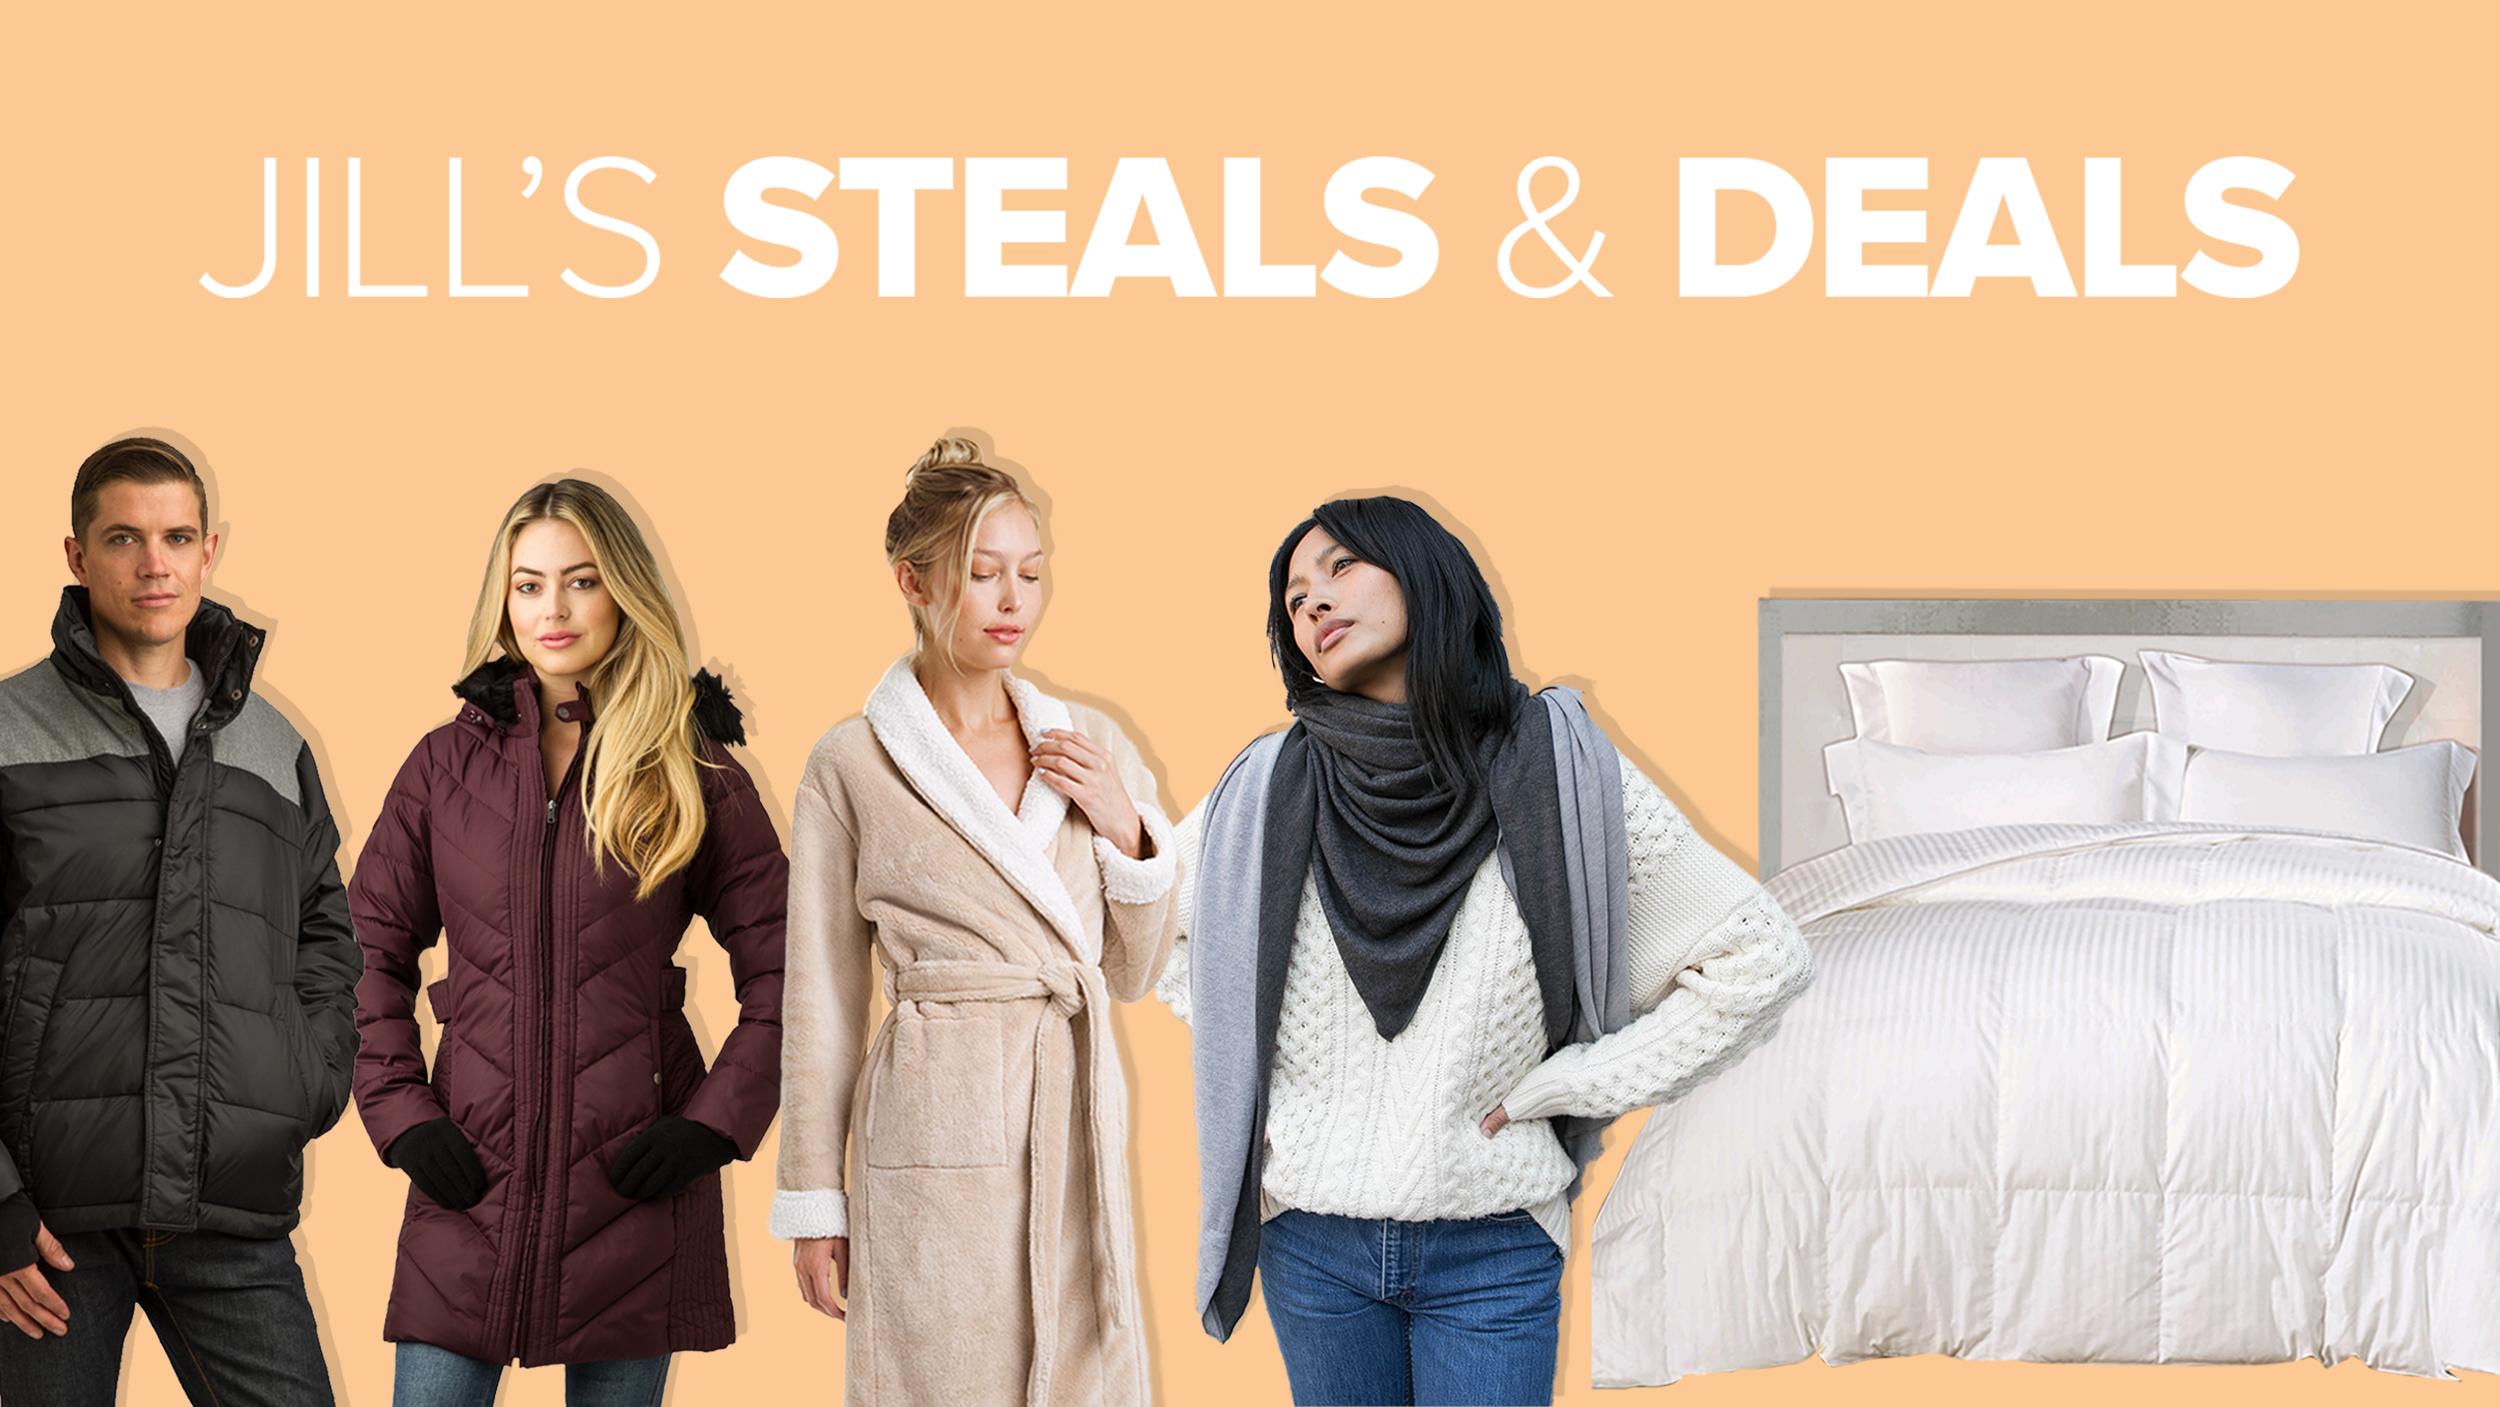 Nbc today show jill's steals and deals 9 21